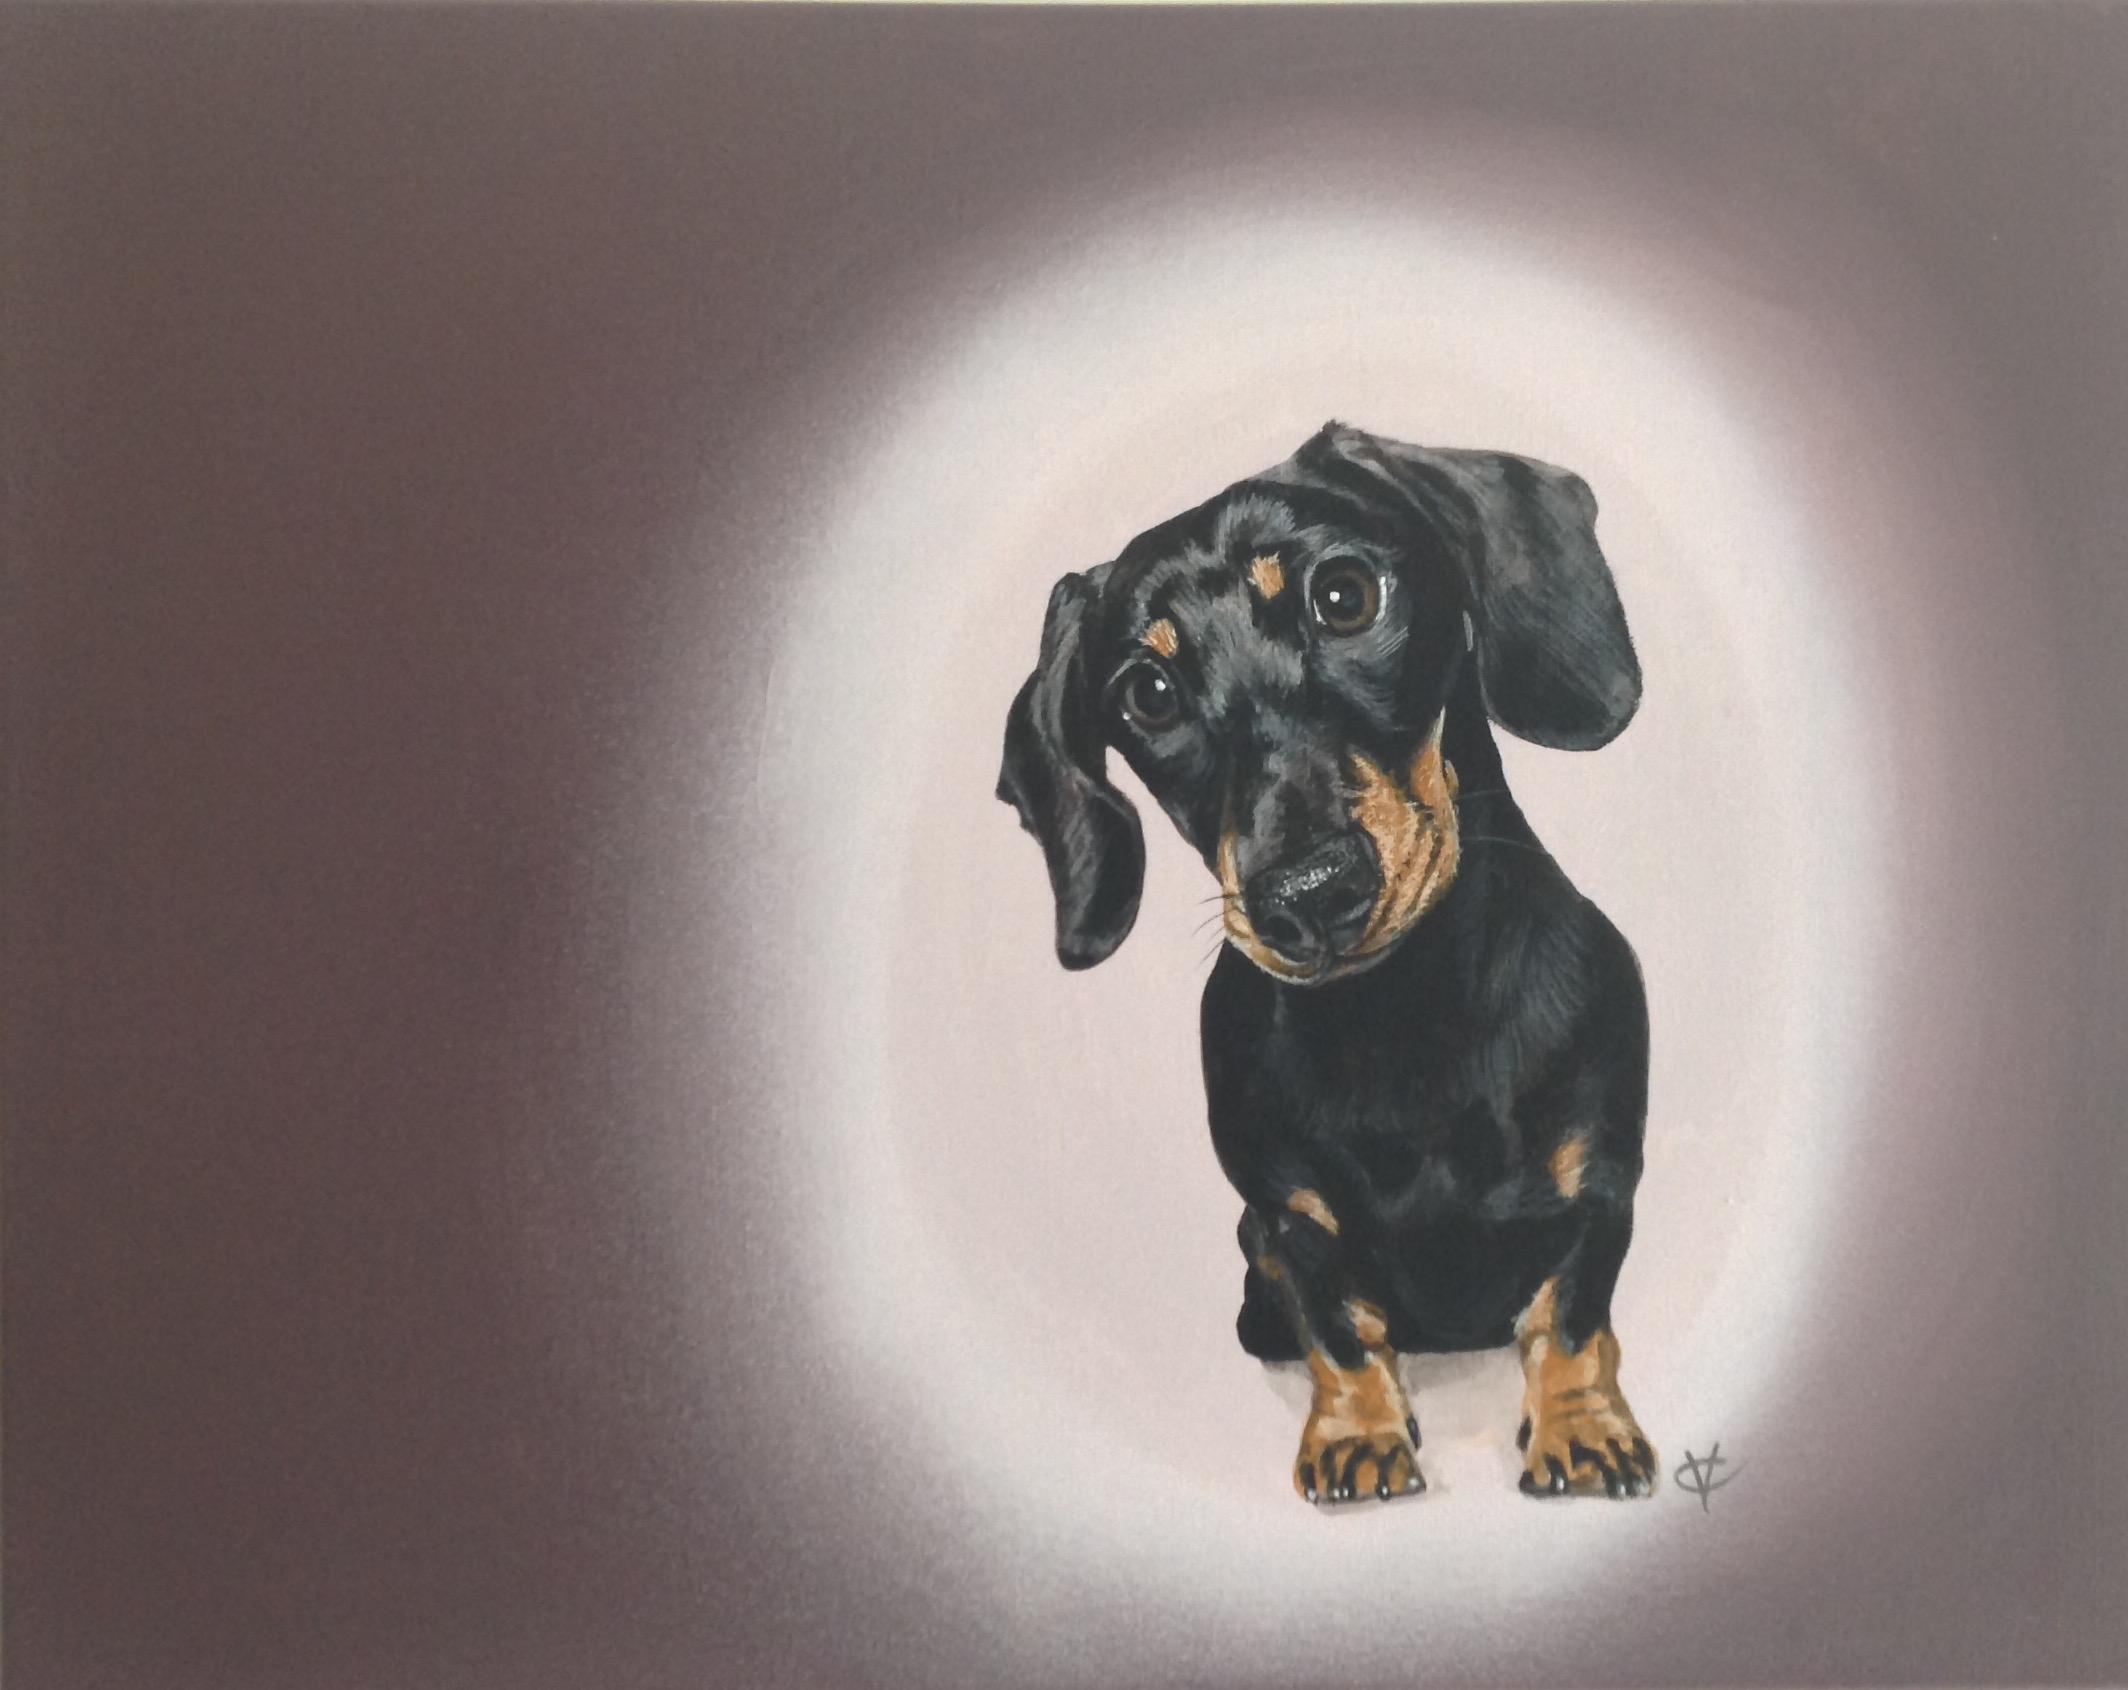 Angel Delight    acrylic on canvas   16 x 20  £260